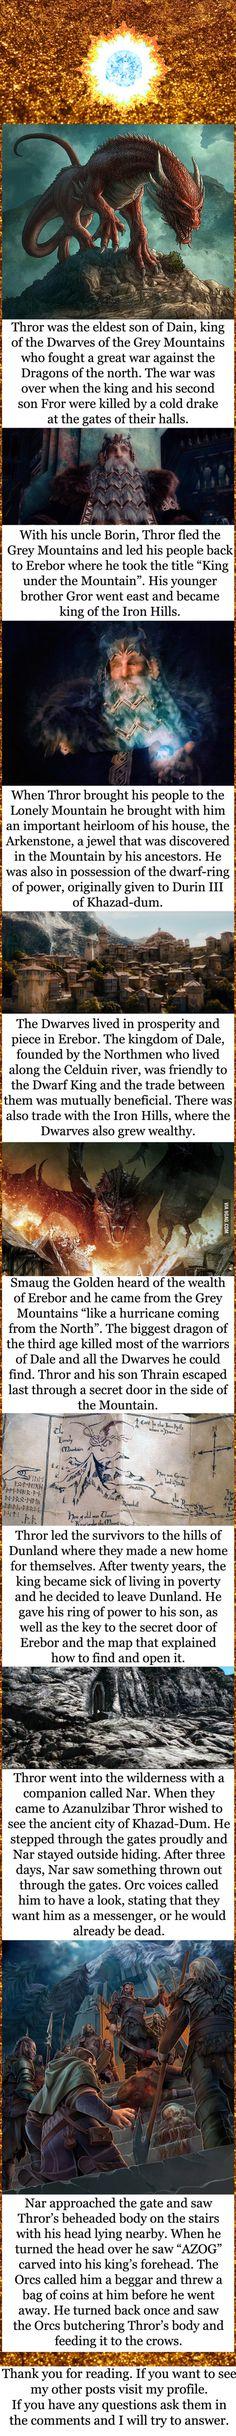 Tolkien lore - Thror